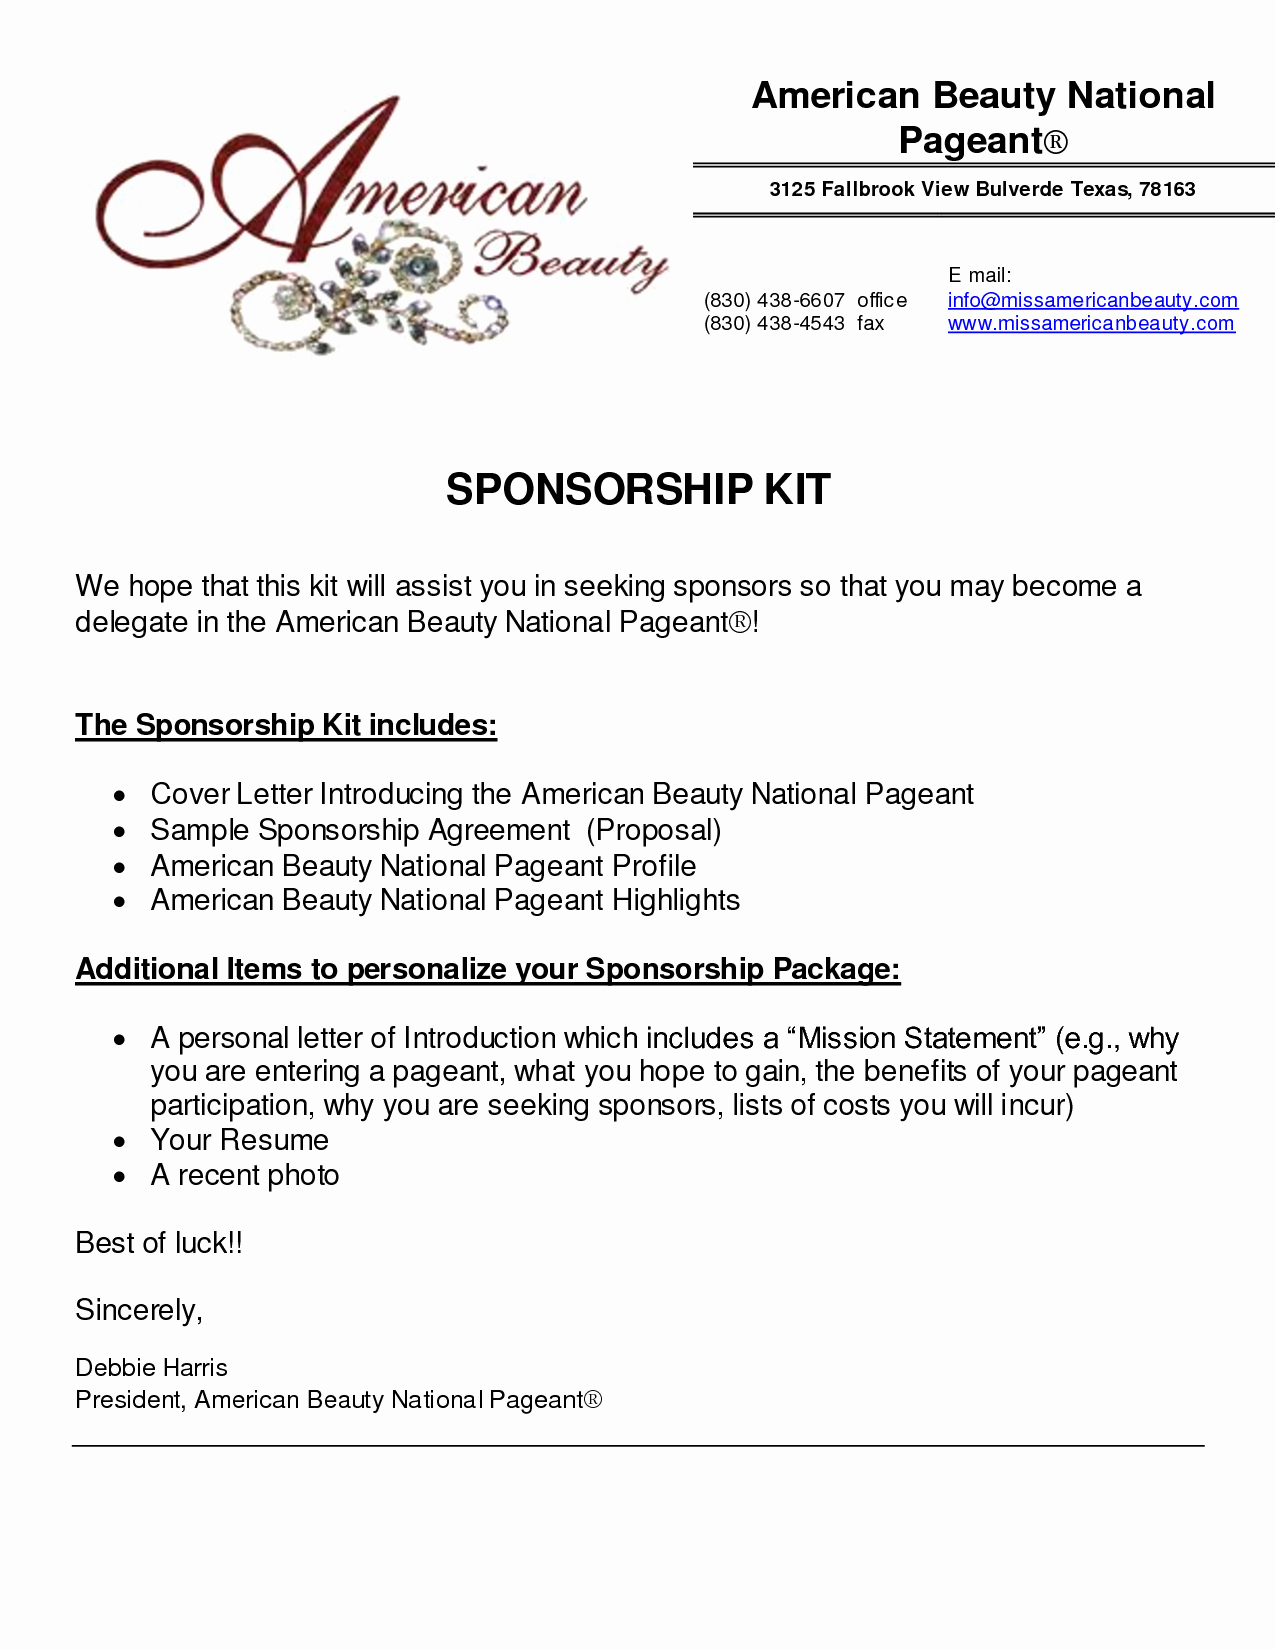 Sponsorship Proposal Template Free Luxury 6 Sponsorship Proposal Templates Excel Pdf formats